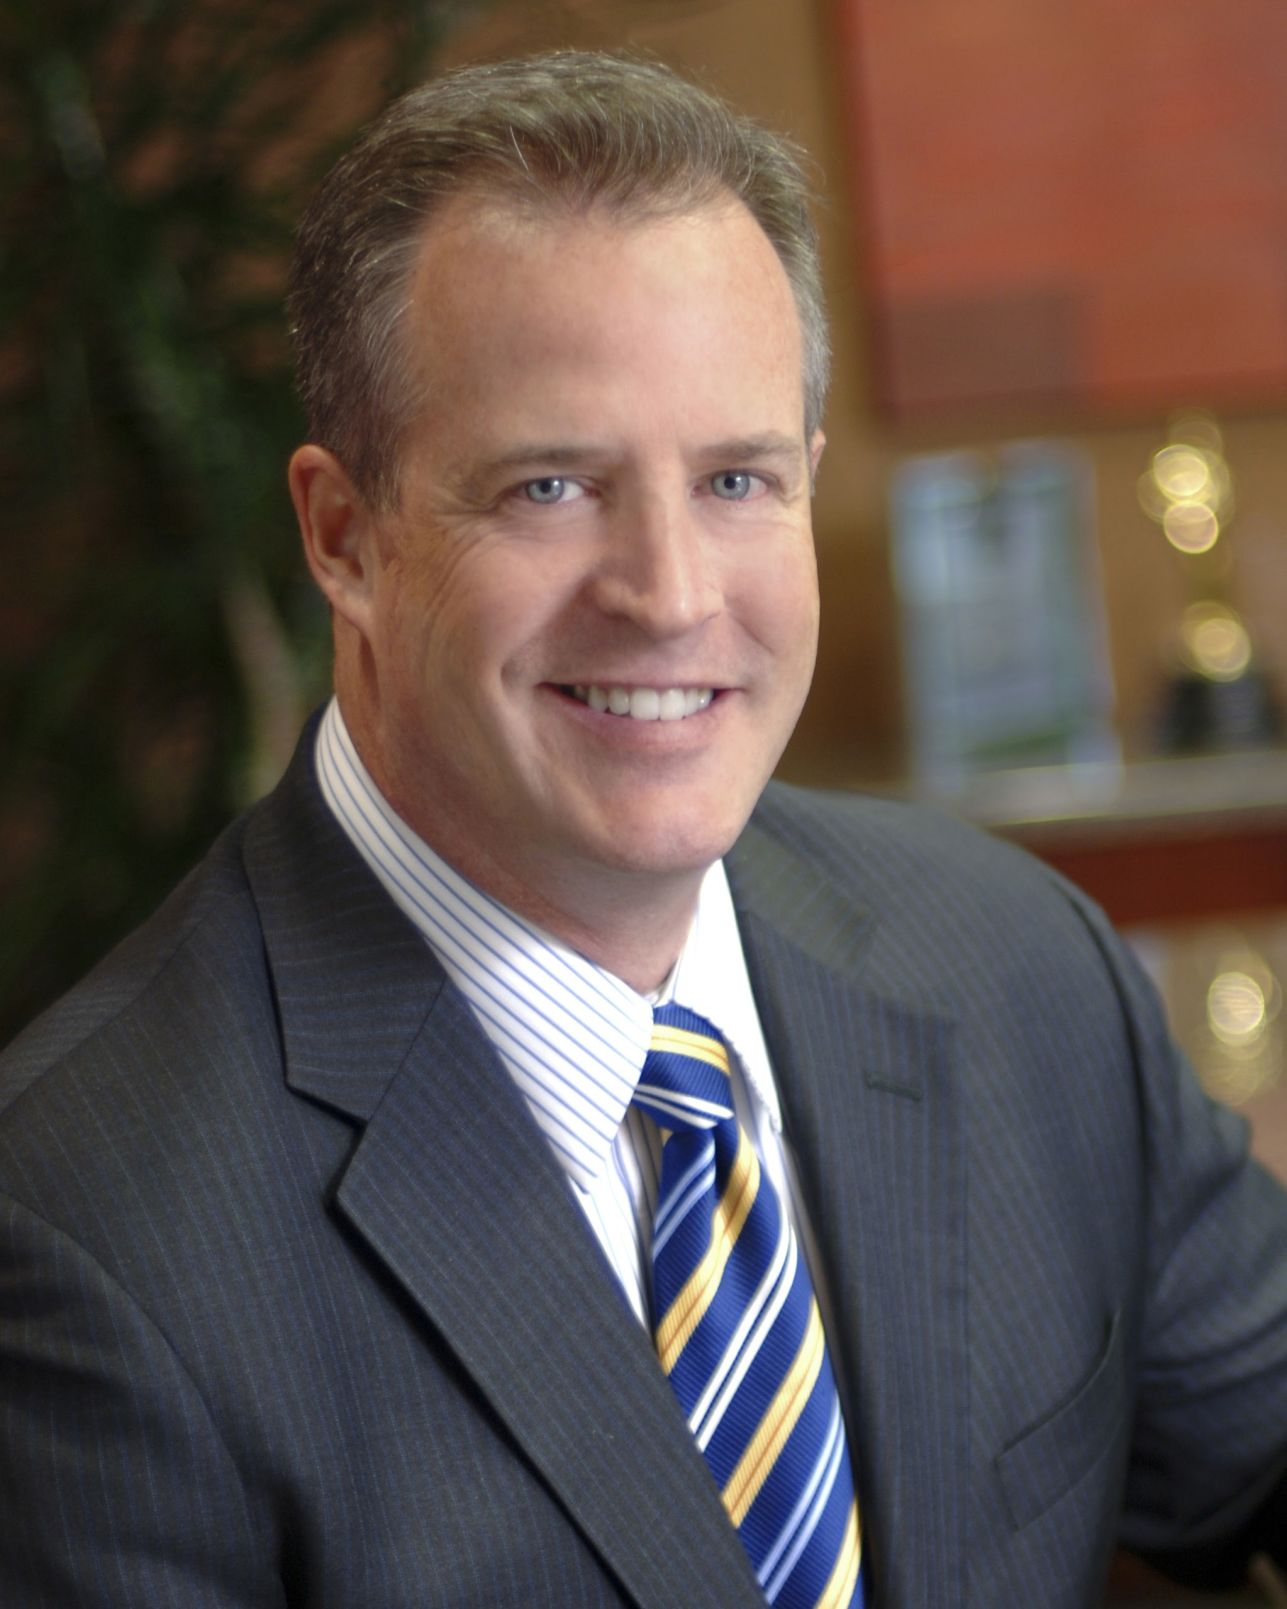 Scott Sweeney